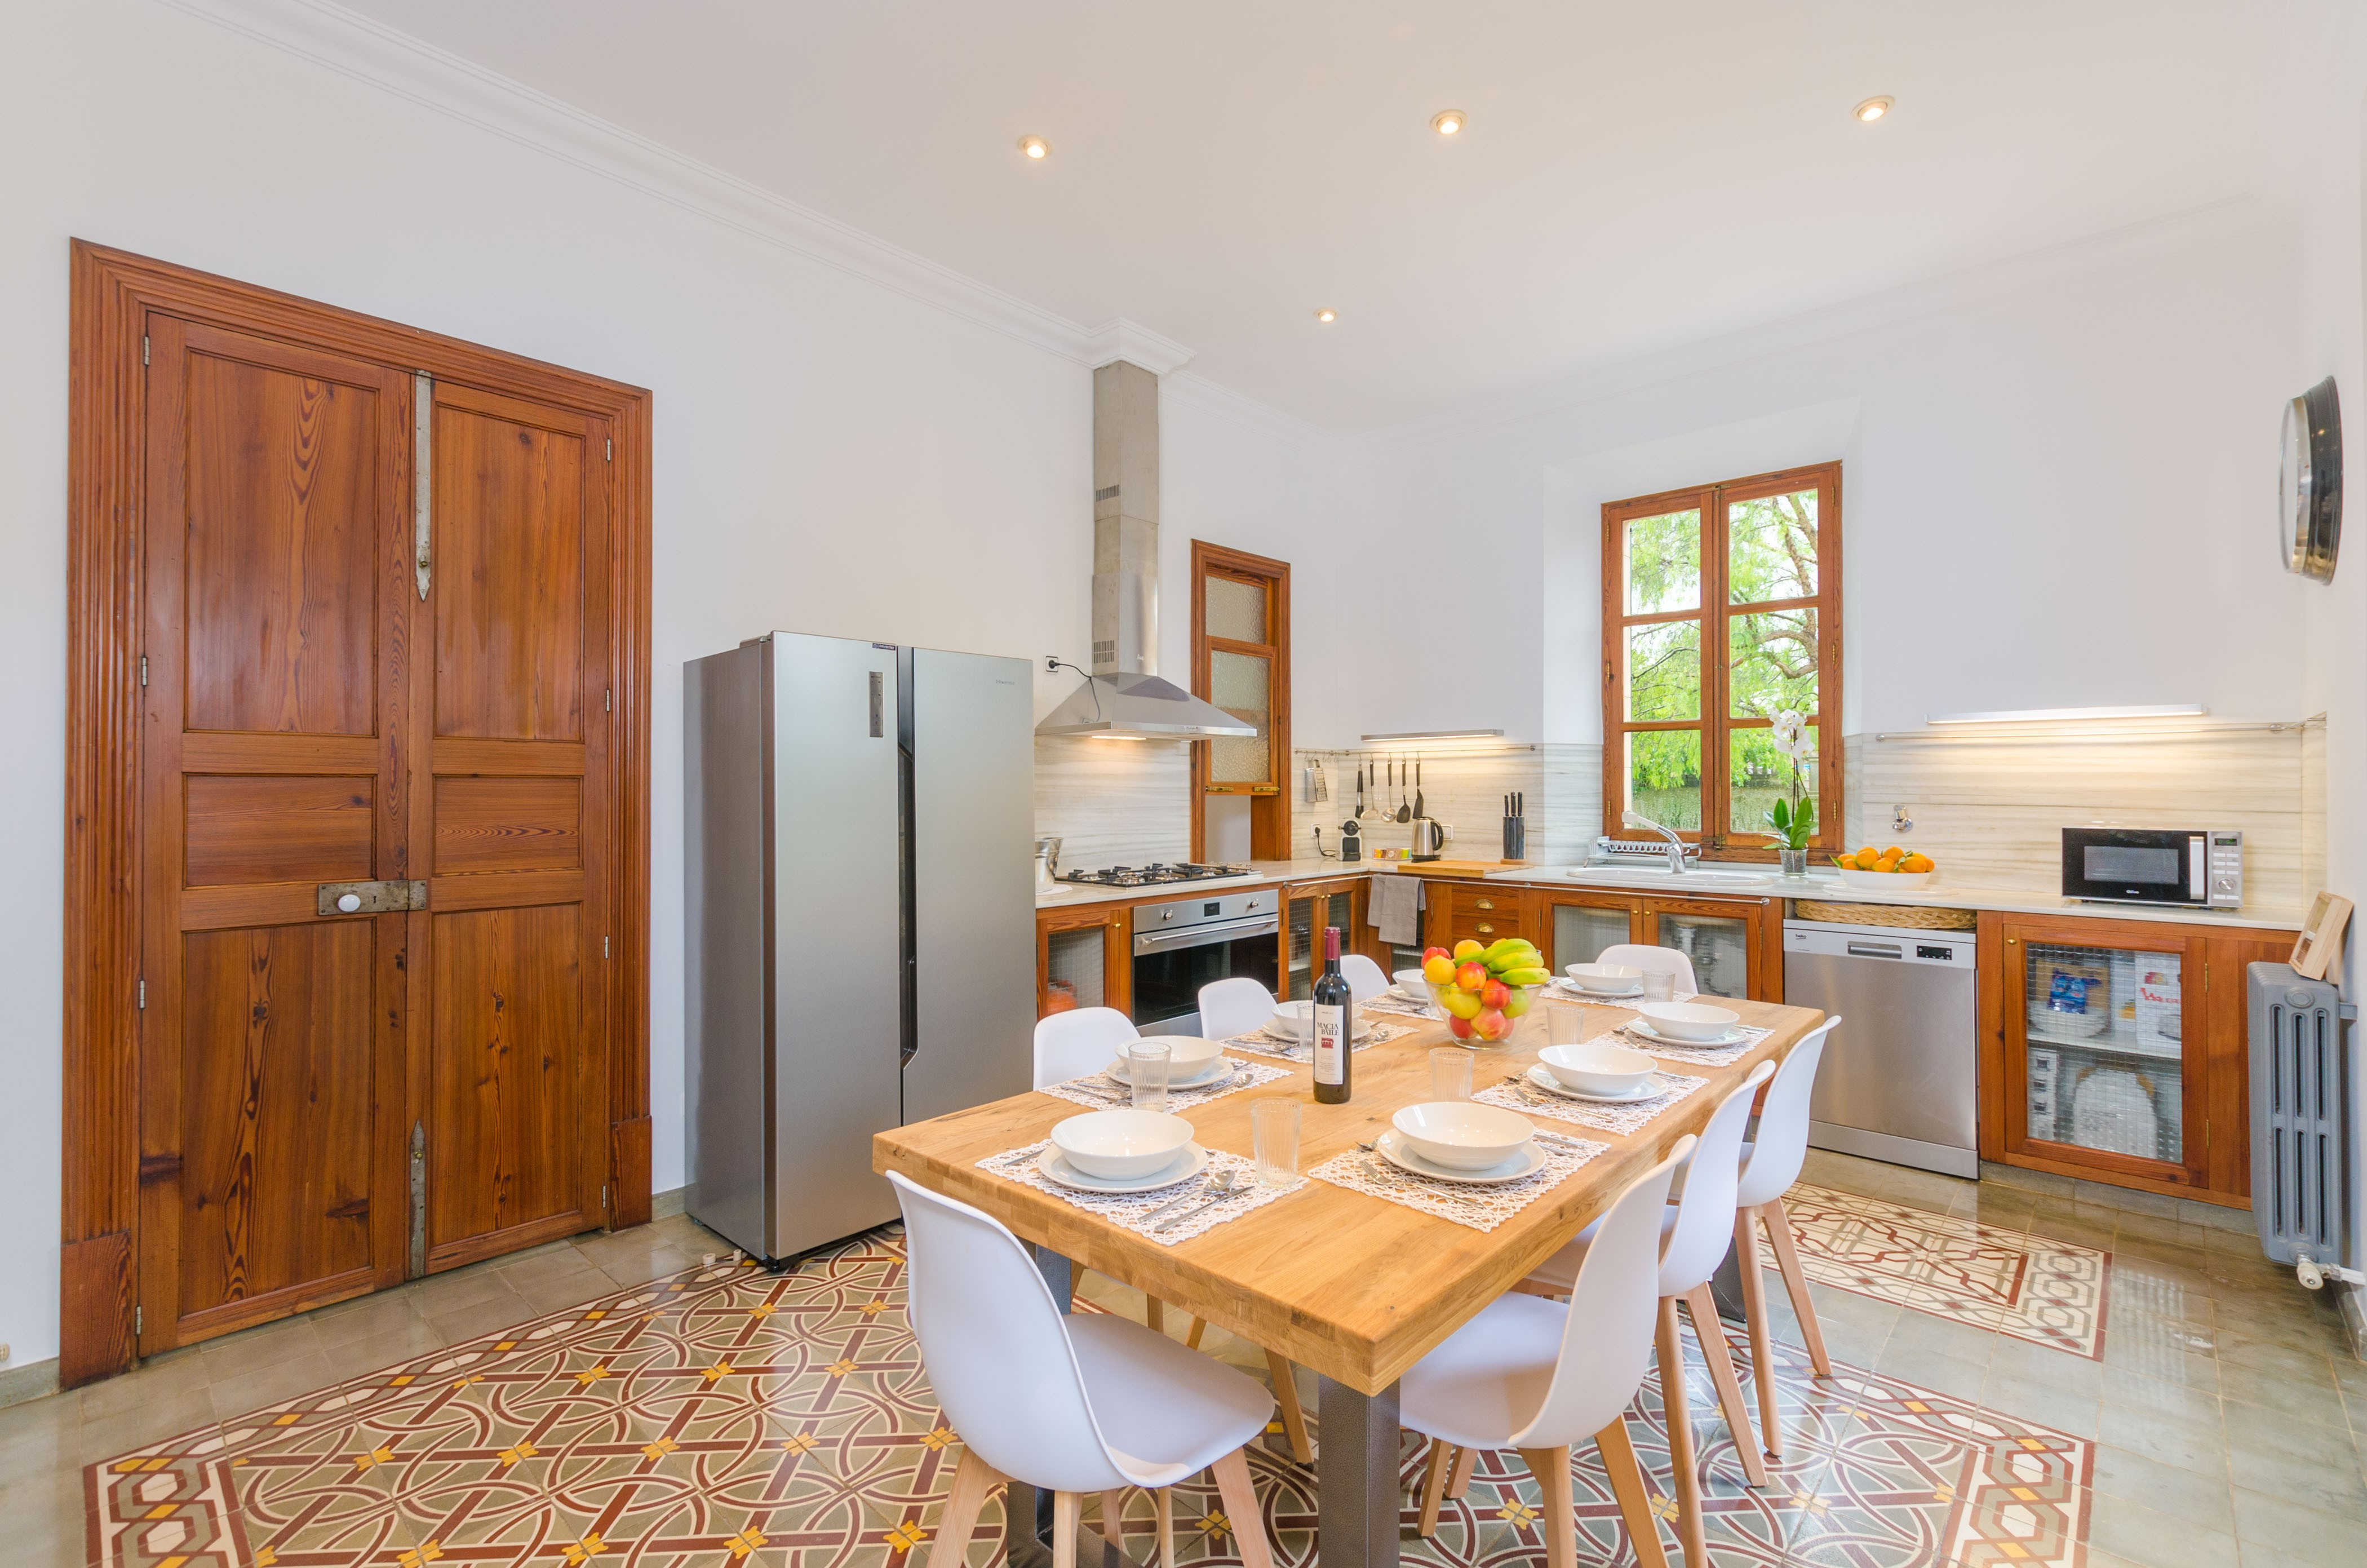 Maison de vacances CAS CONVIDATS (2435013), Alaro, Majorque, Iles Baléares, Espagne, image 26